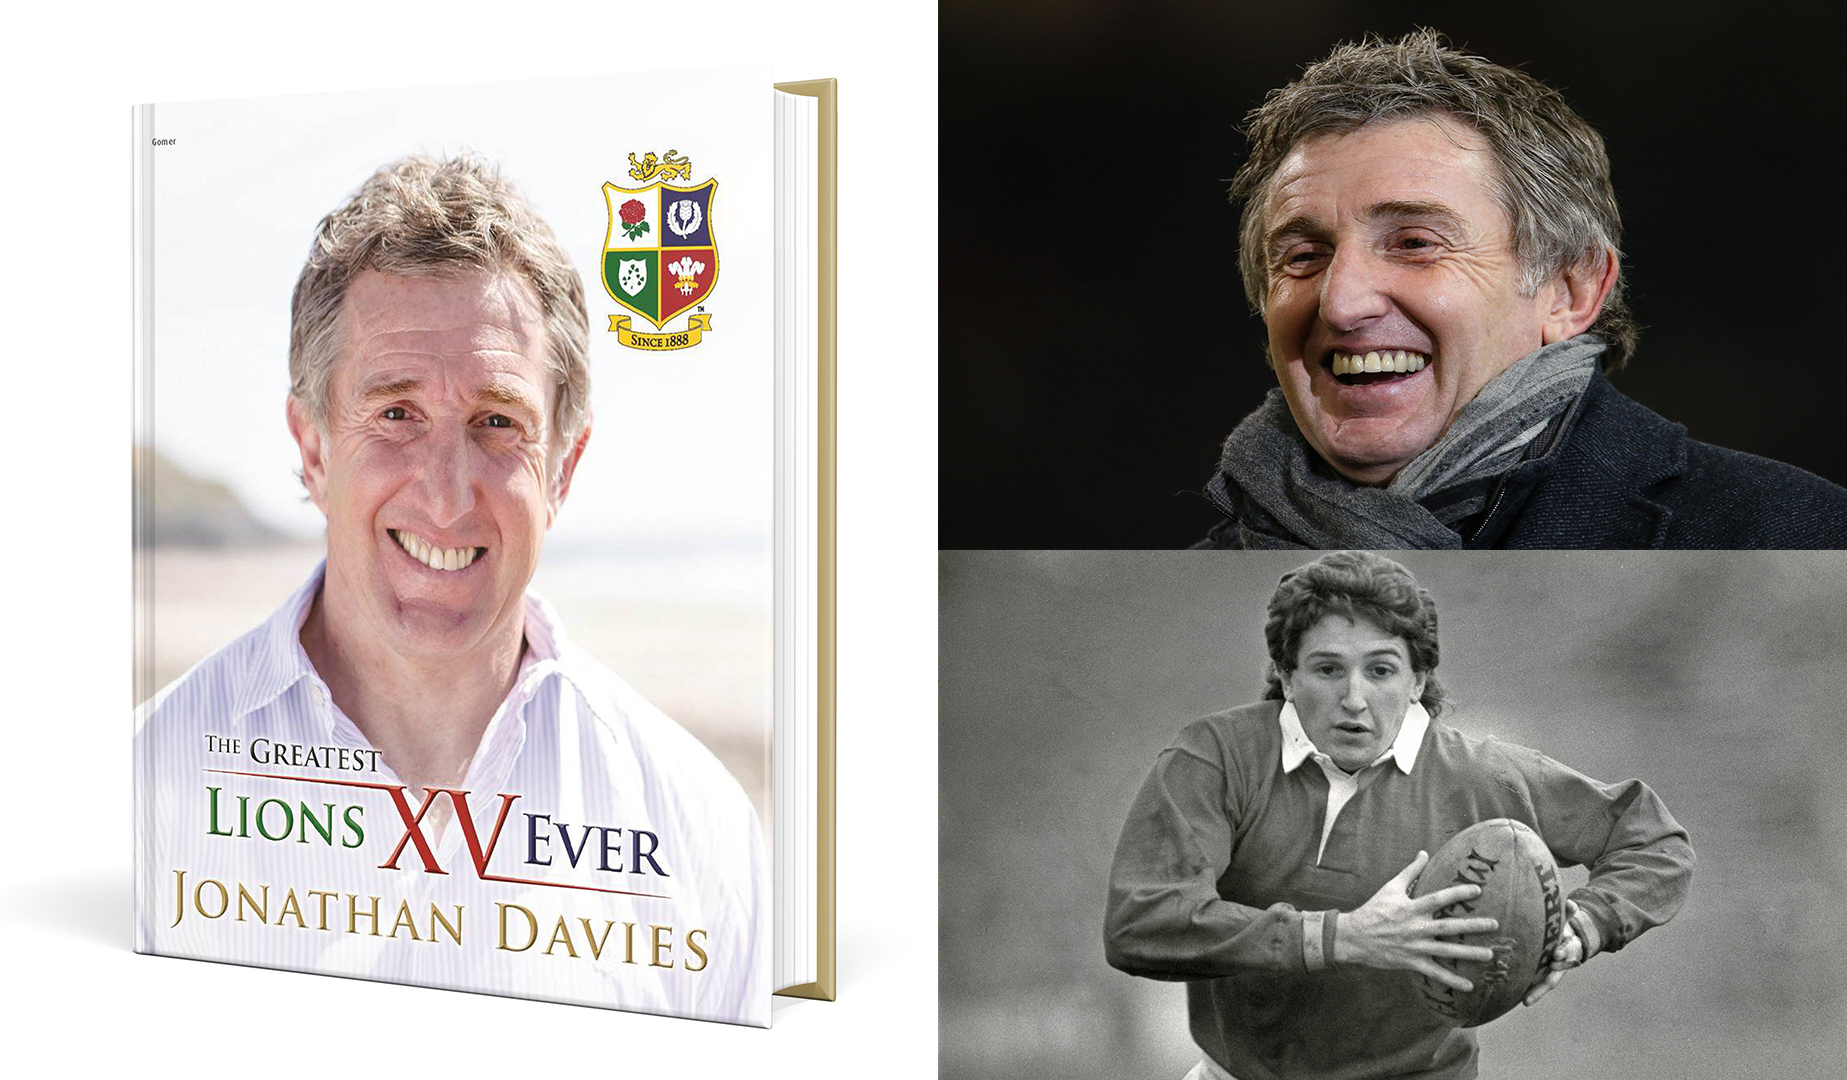 12 Days of Christmas – Win Jonathan Davies' Lions book